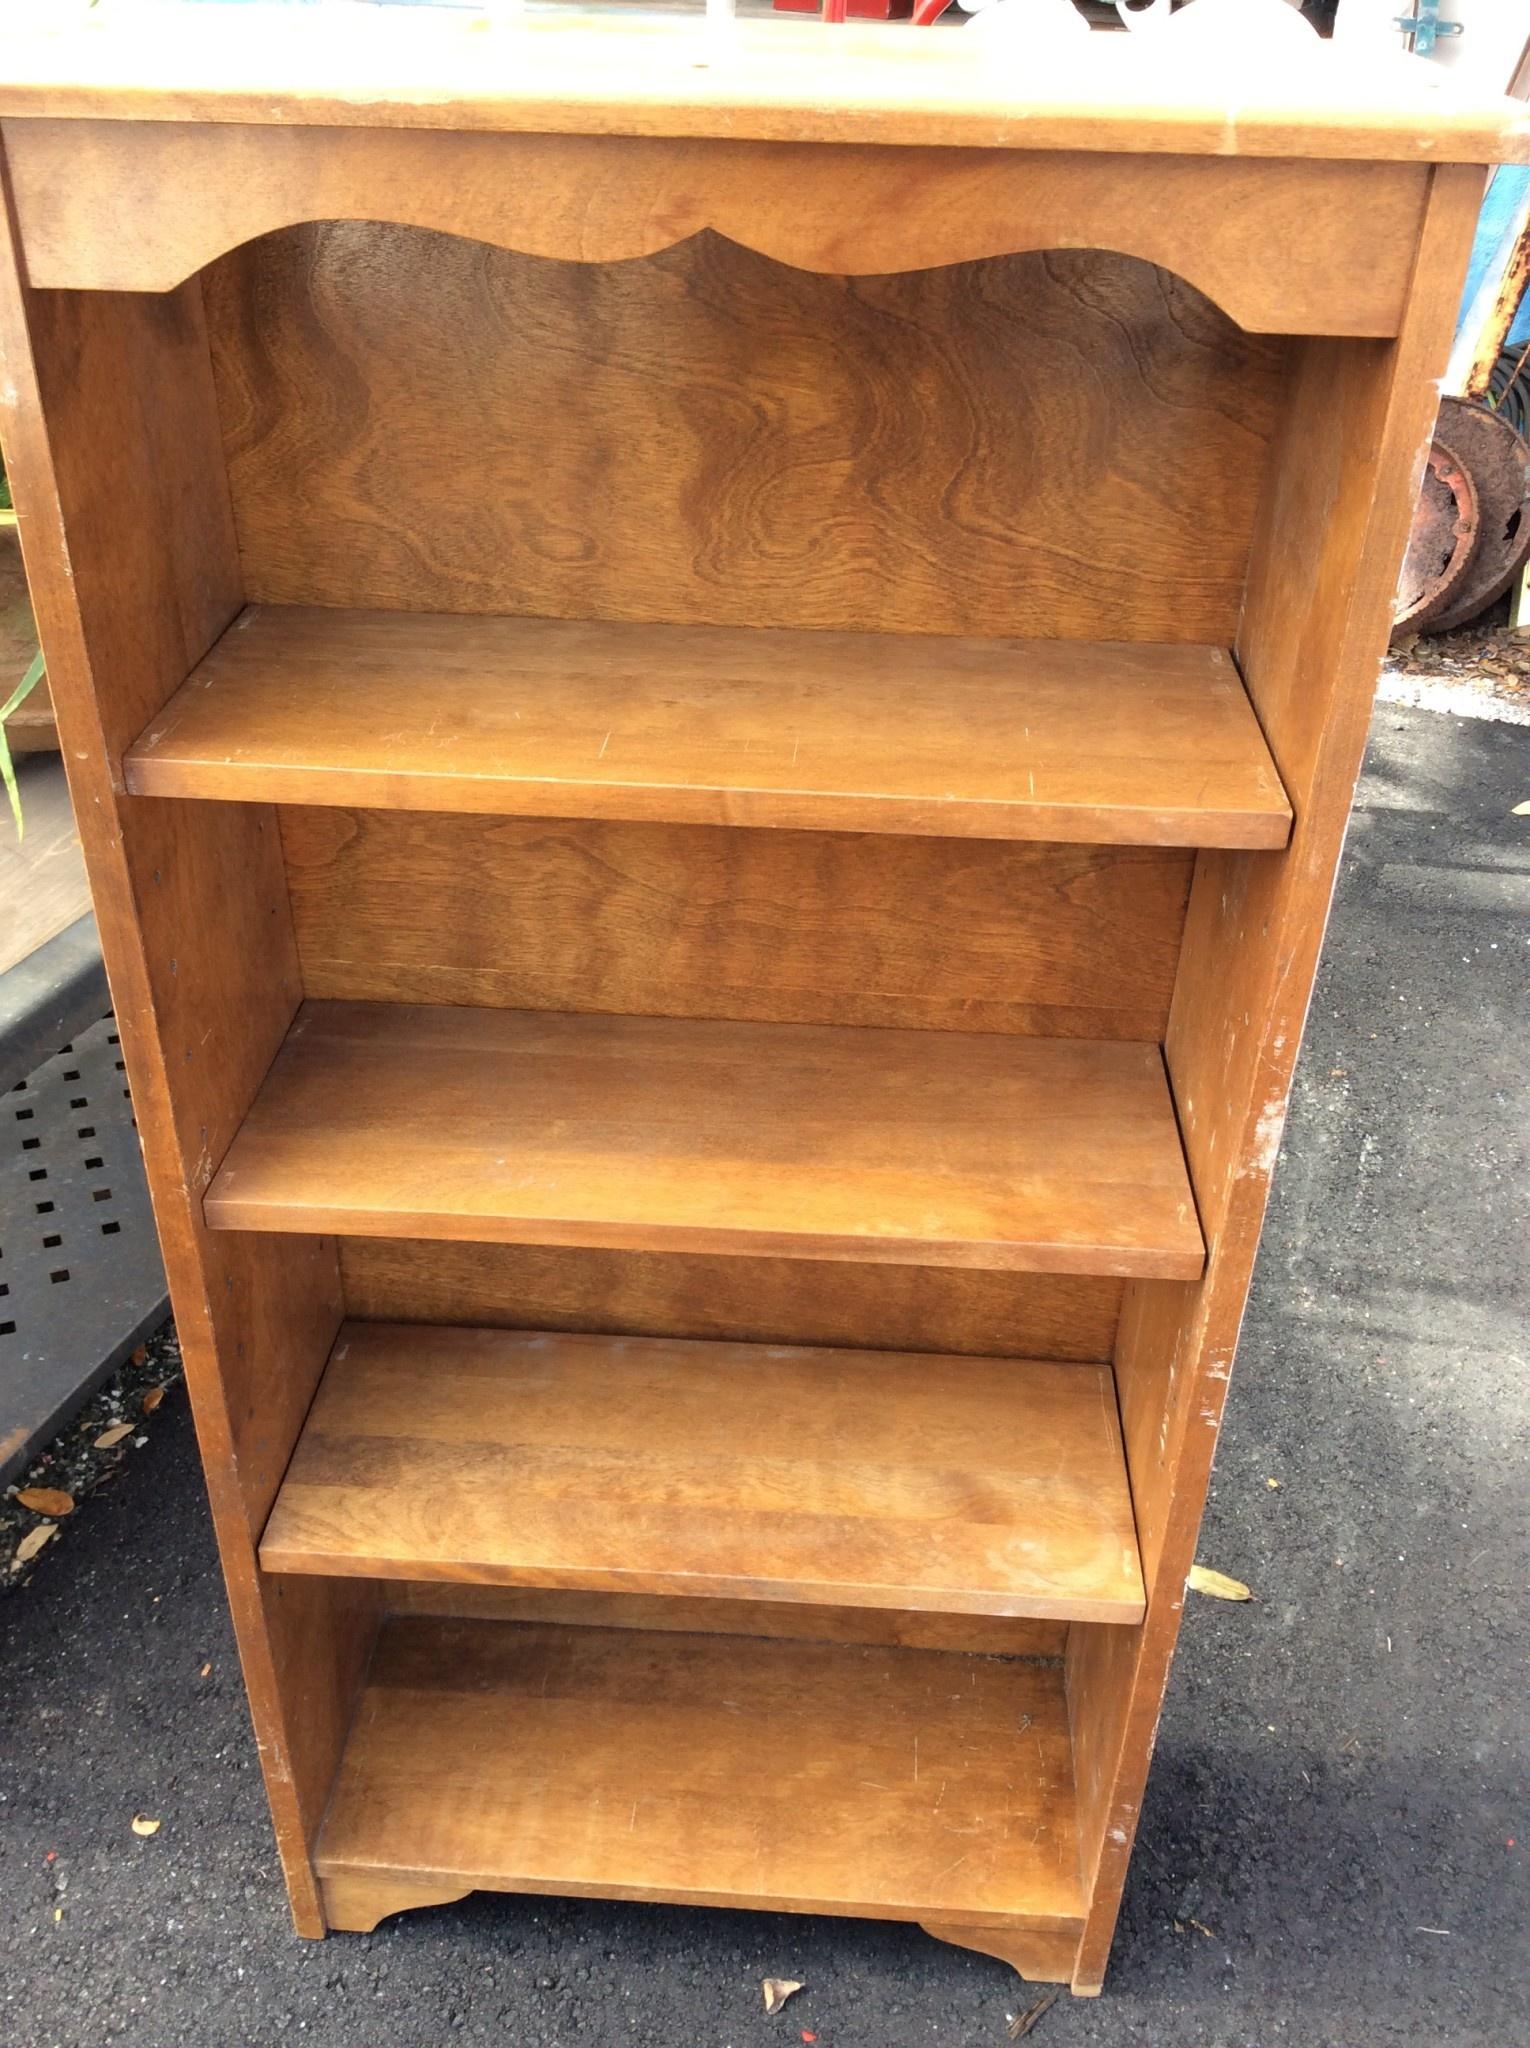 Vintage Bookcase 4ft high - Sarasota Architectural Salvage, 1093